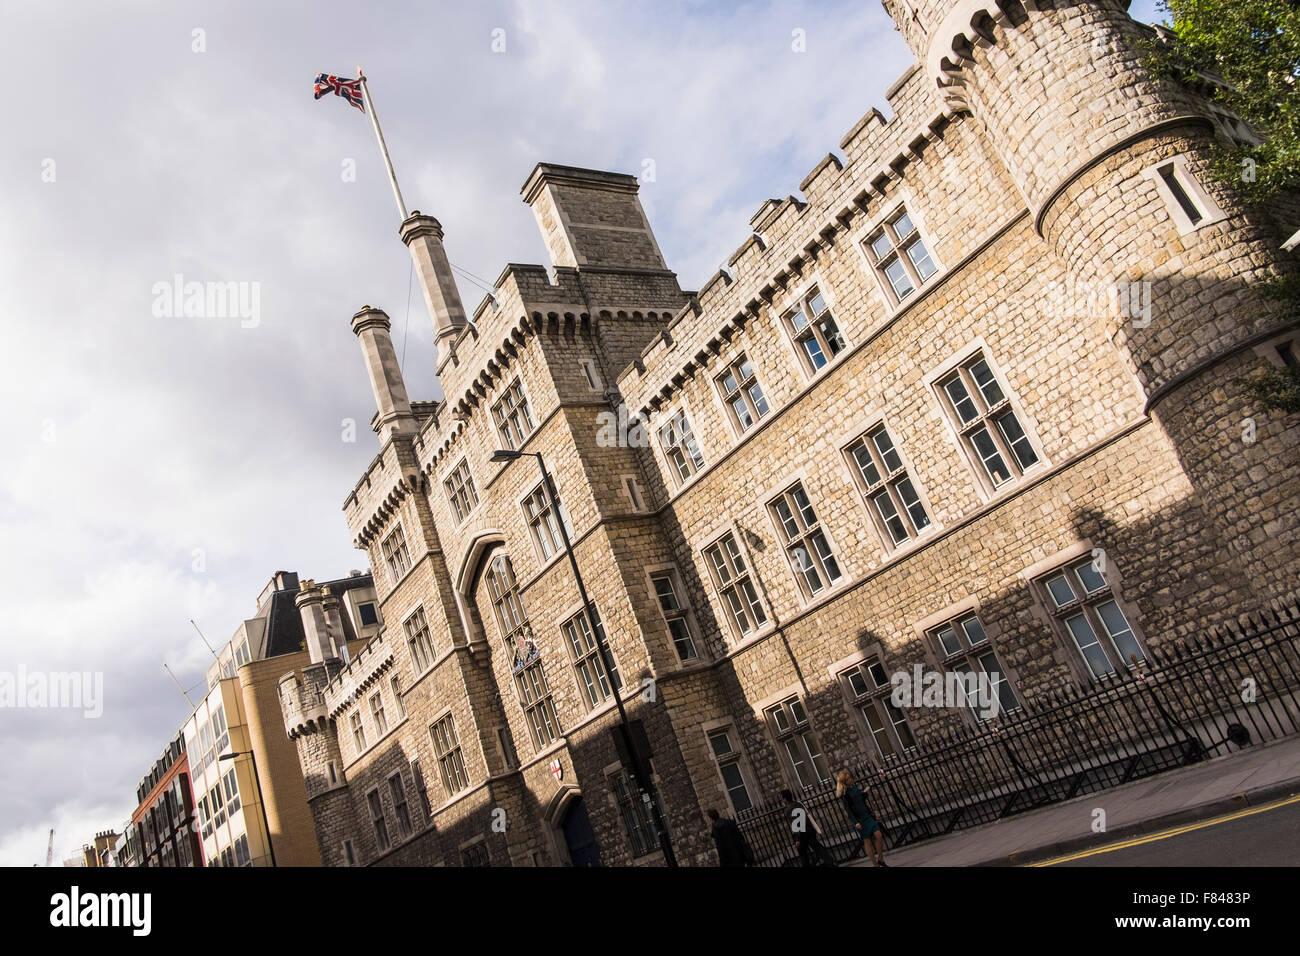 Finsbury Barracas, City Road, Londres, Inglaterra, Reino Unido. Imagen De Stock